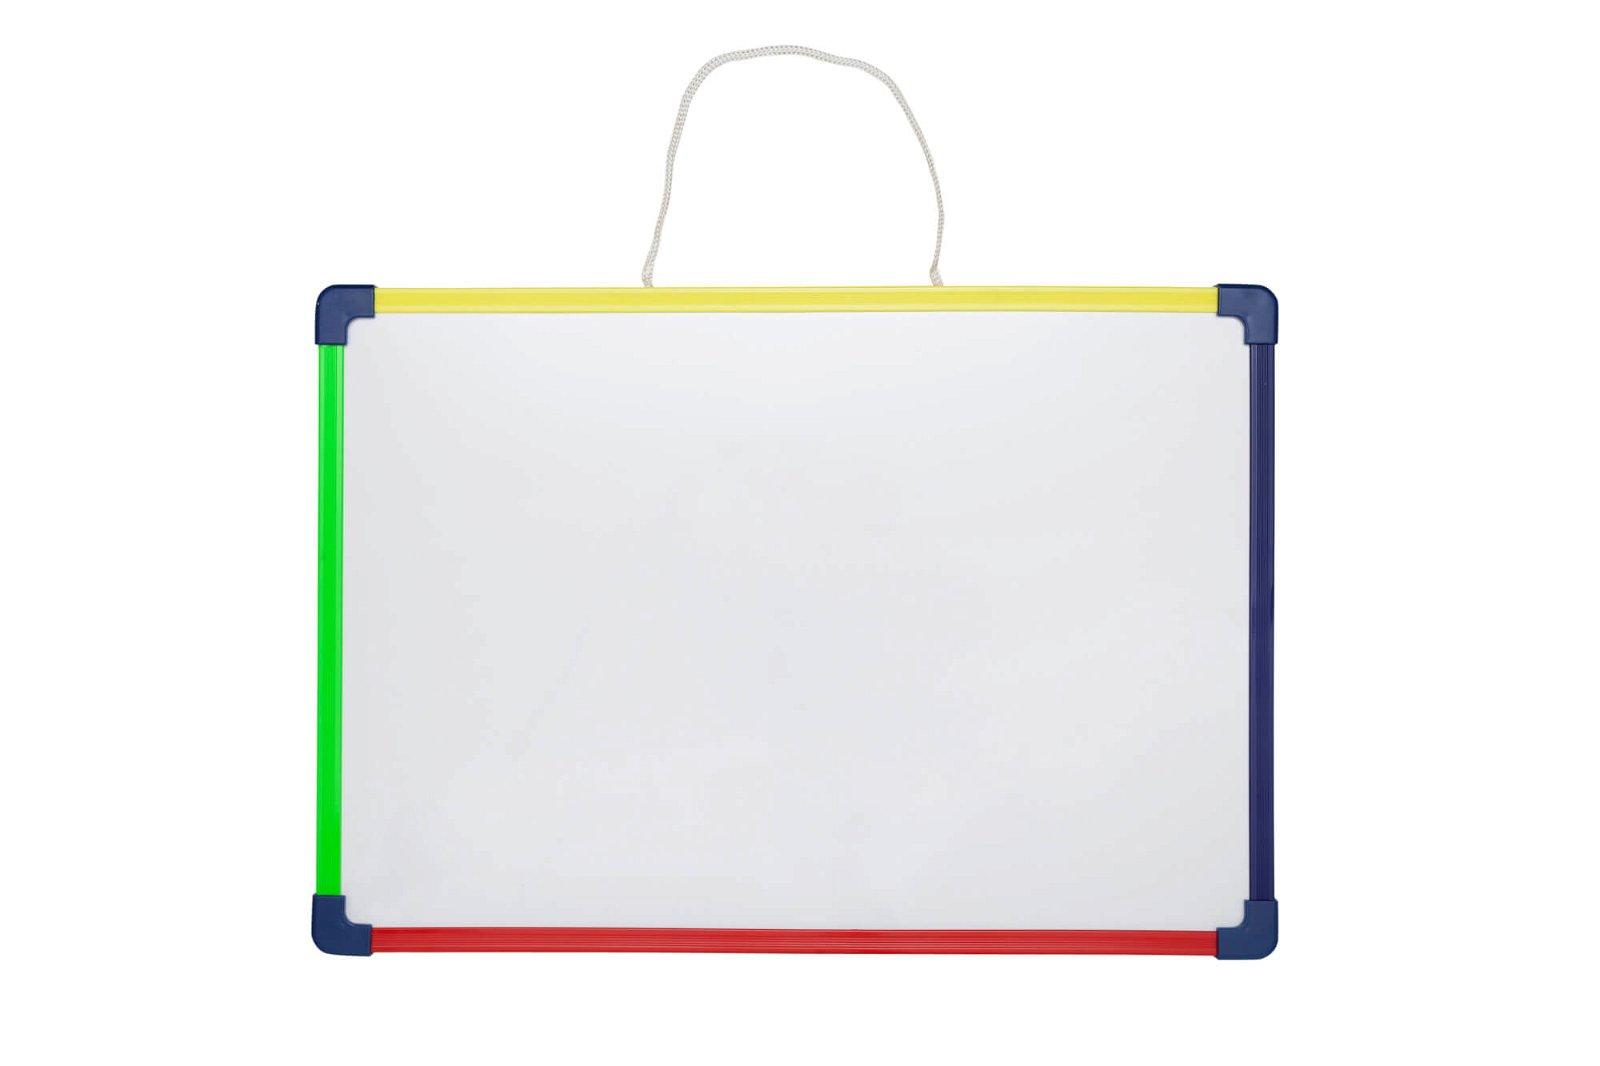 Kinder-Whiteboard, 28x40 cm,  SB-Verpackung, farbig sortiert